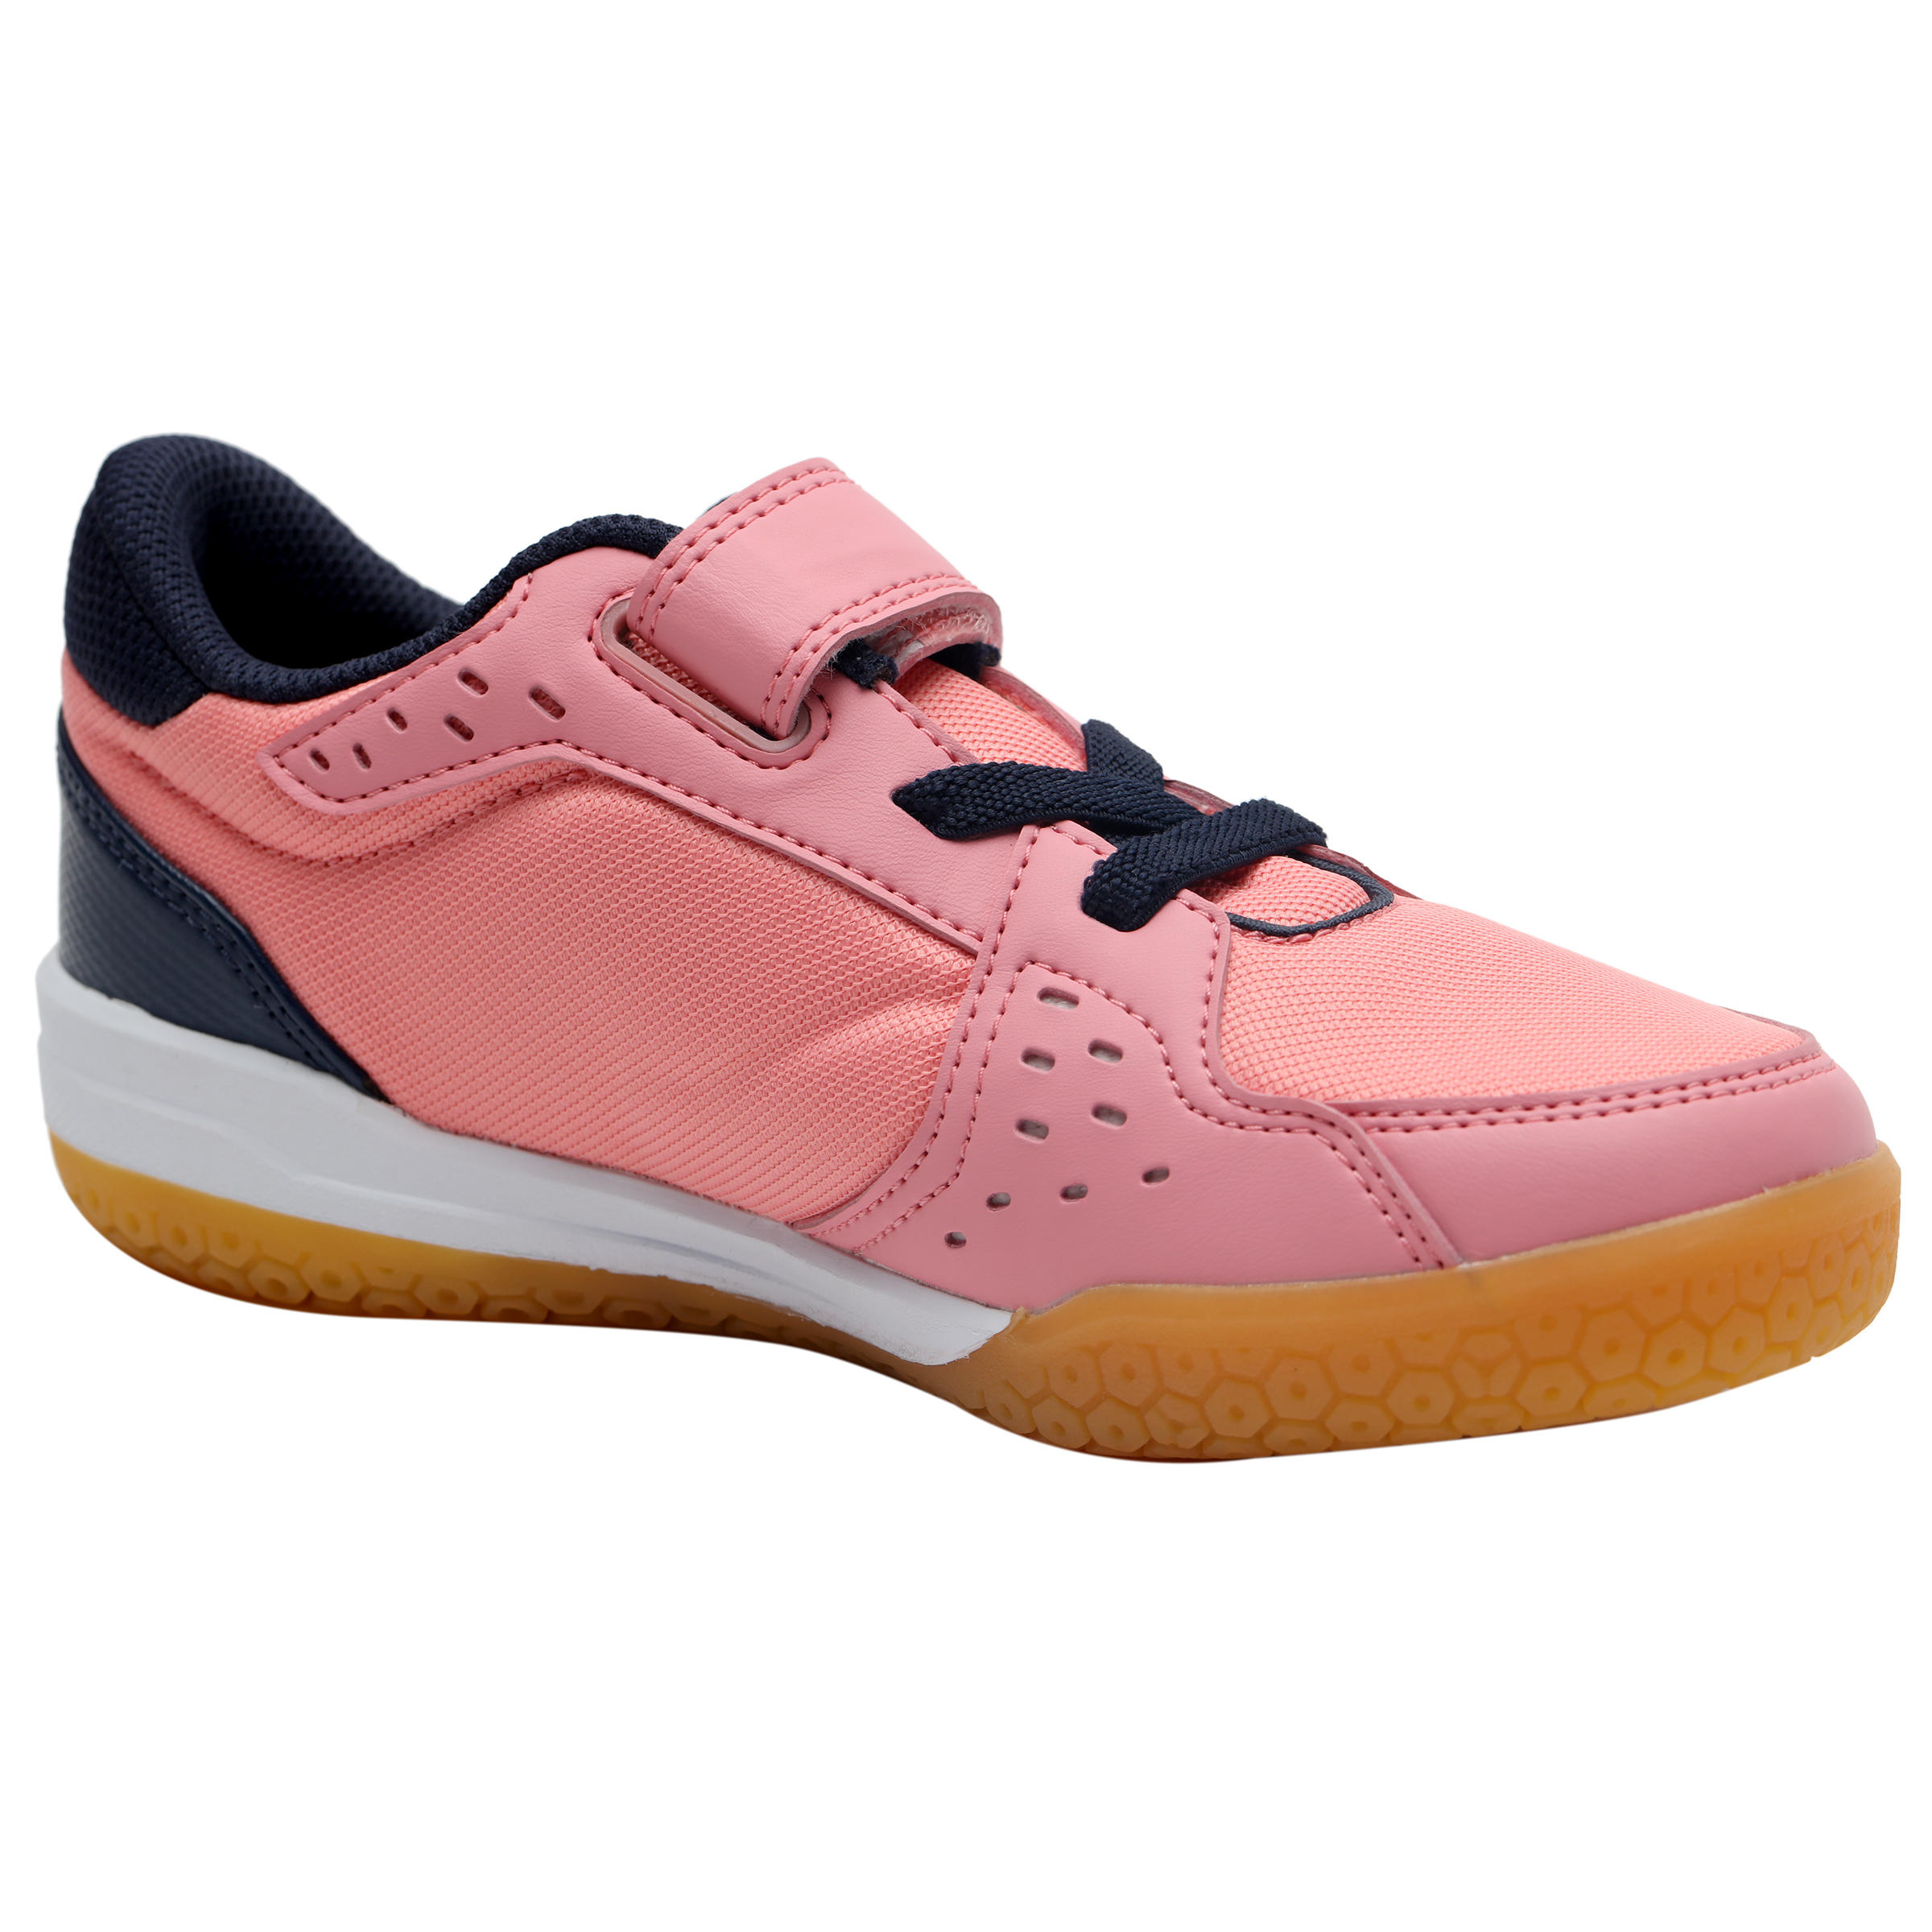 Kids' Badminton Shoes BS730 JR - Pink